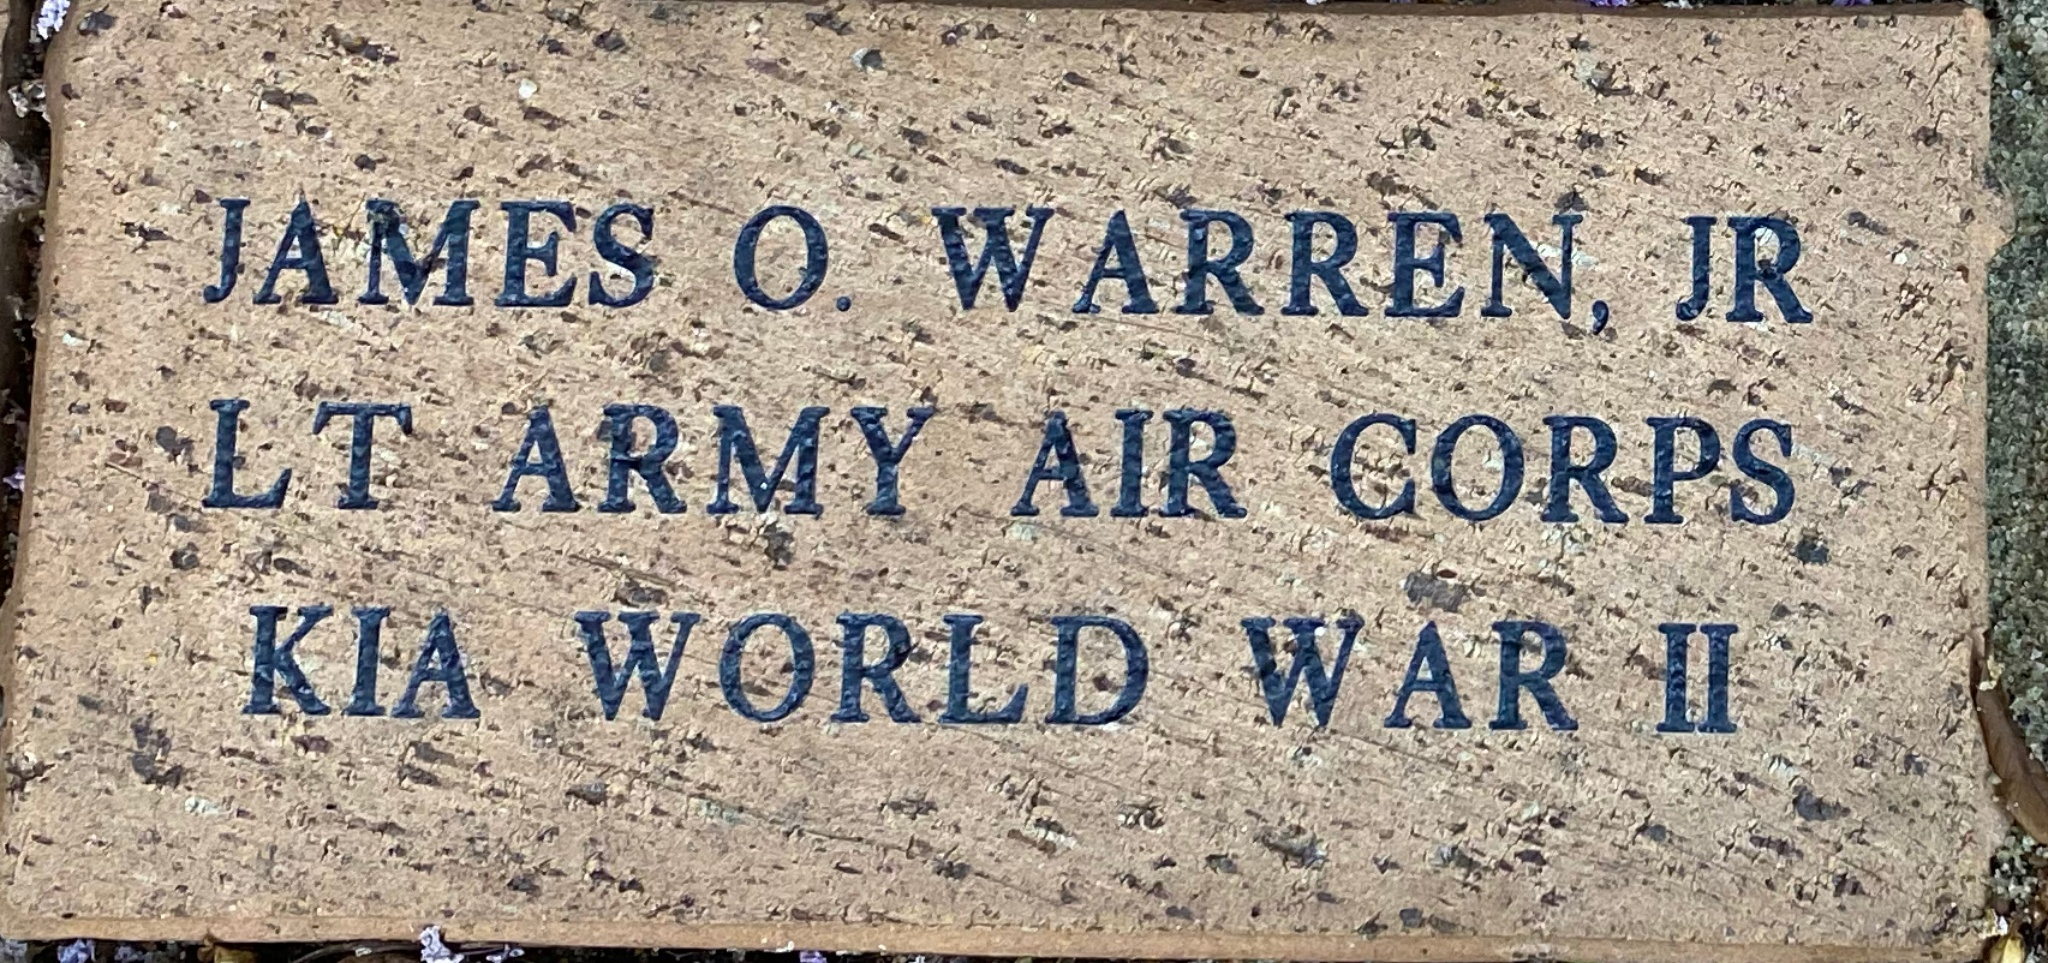 JAMES O. WARREN, JR LT ARMY AIR CORPS KIA WORLD WAR II